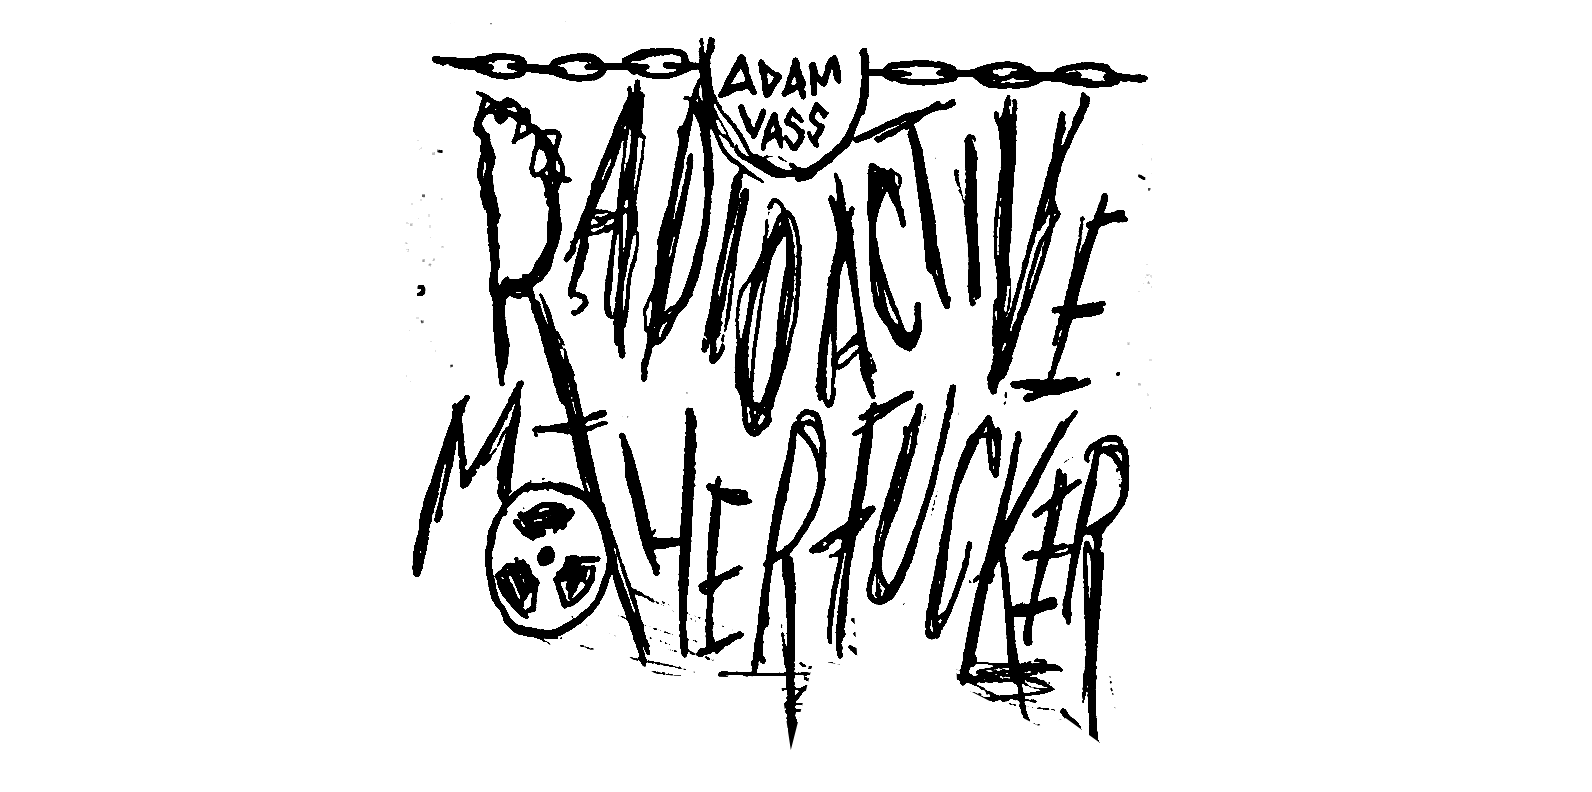 Adam Vass Radioactive Motherfucker